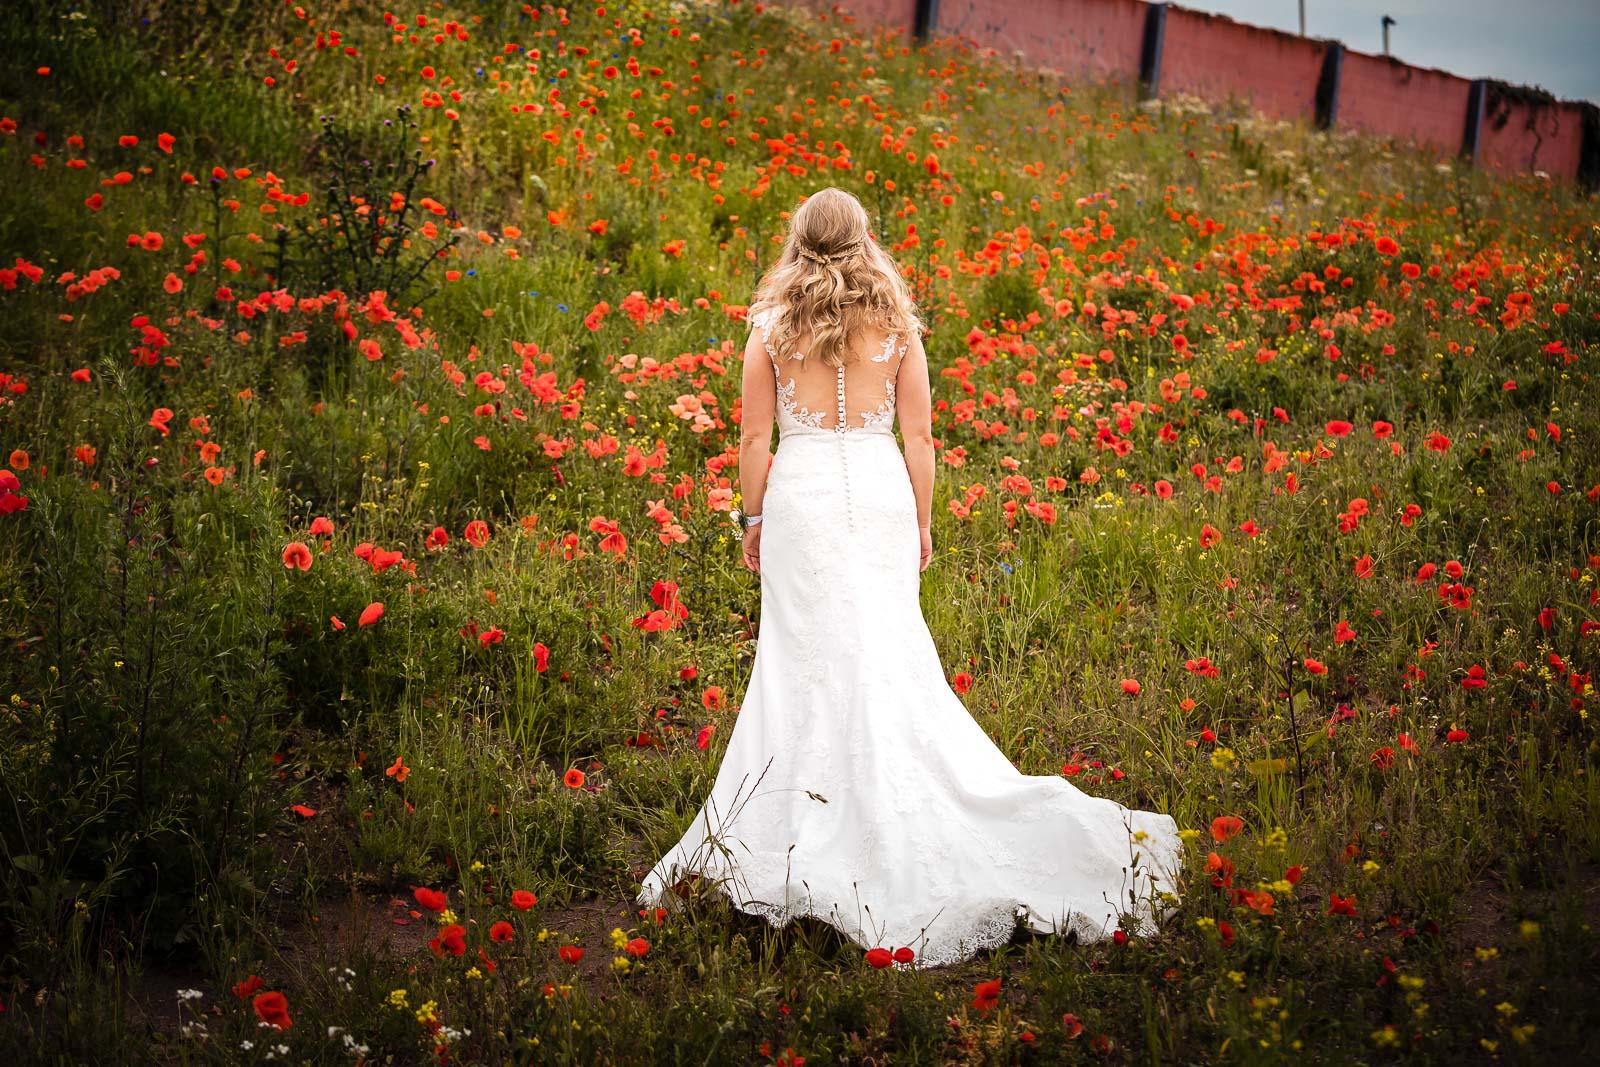 Bruidsfotograaf | Pure bruidsfotografie